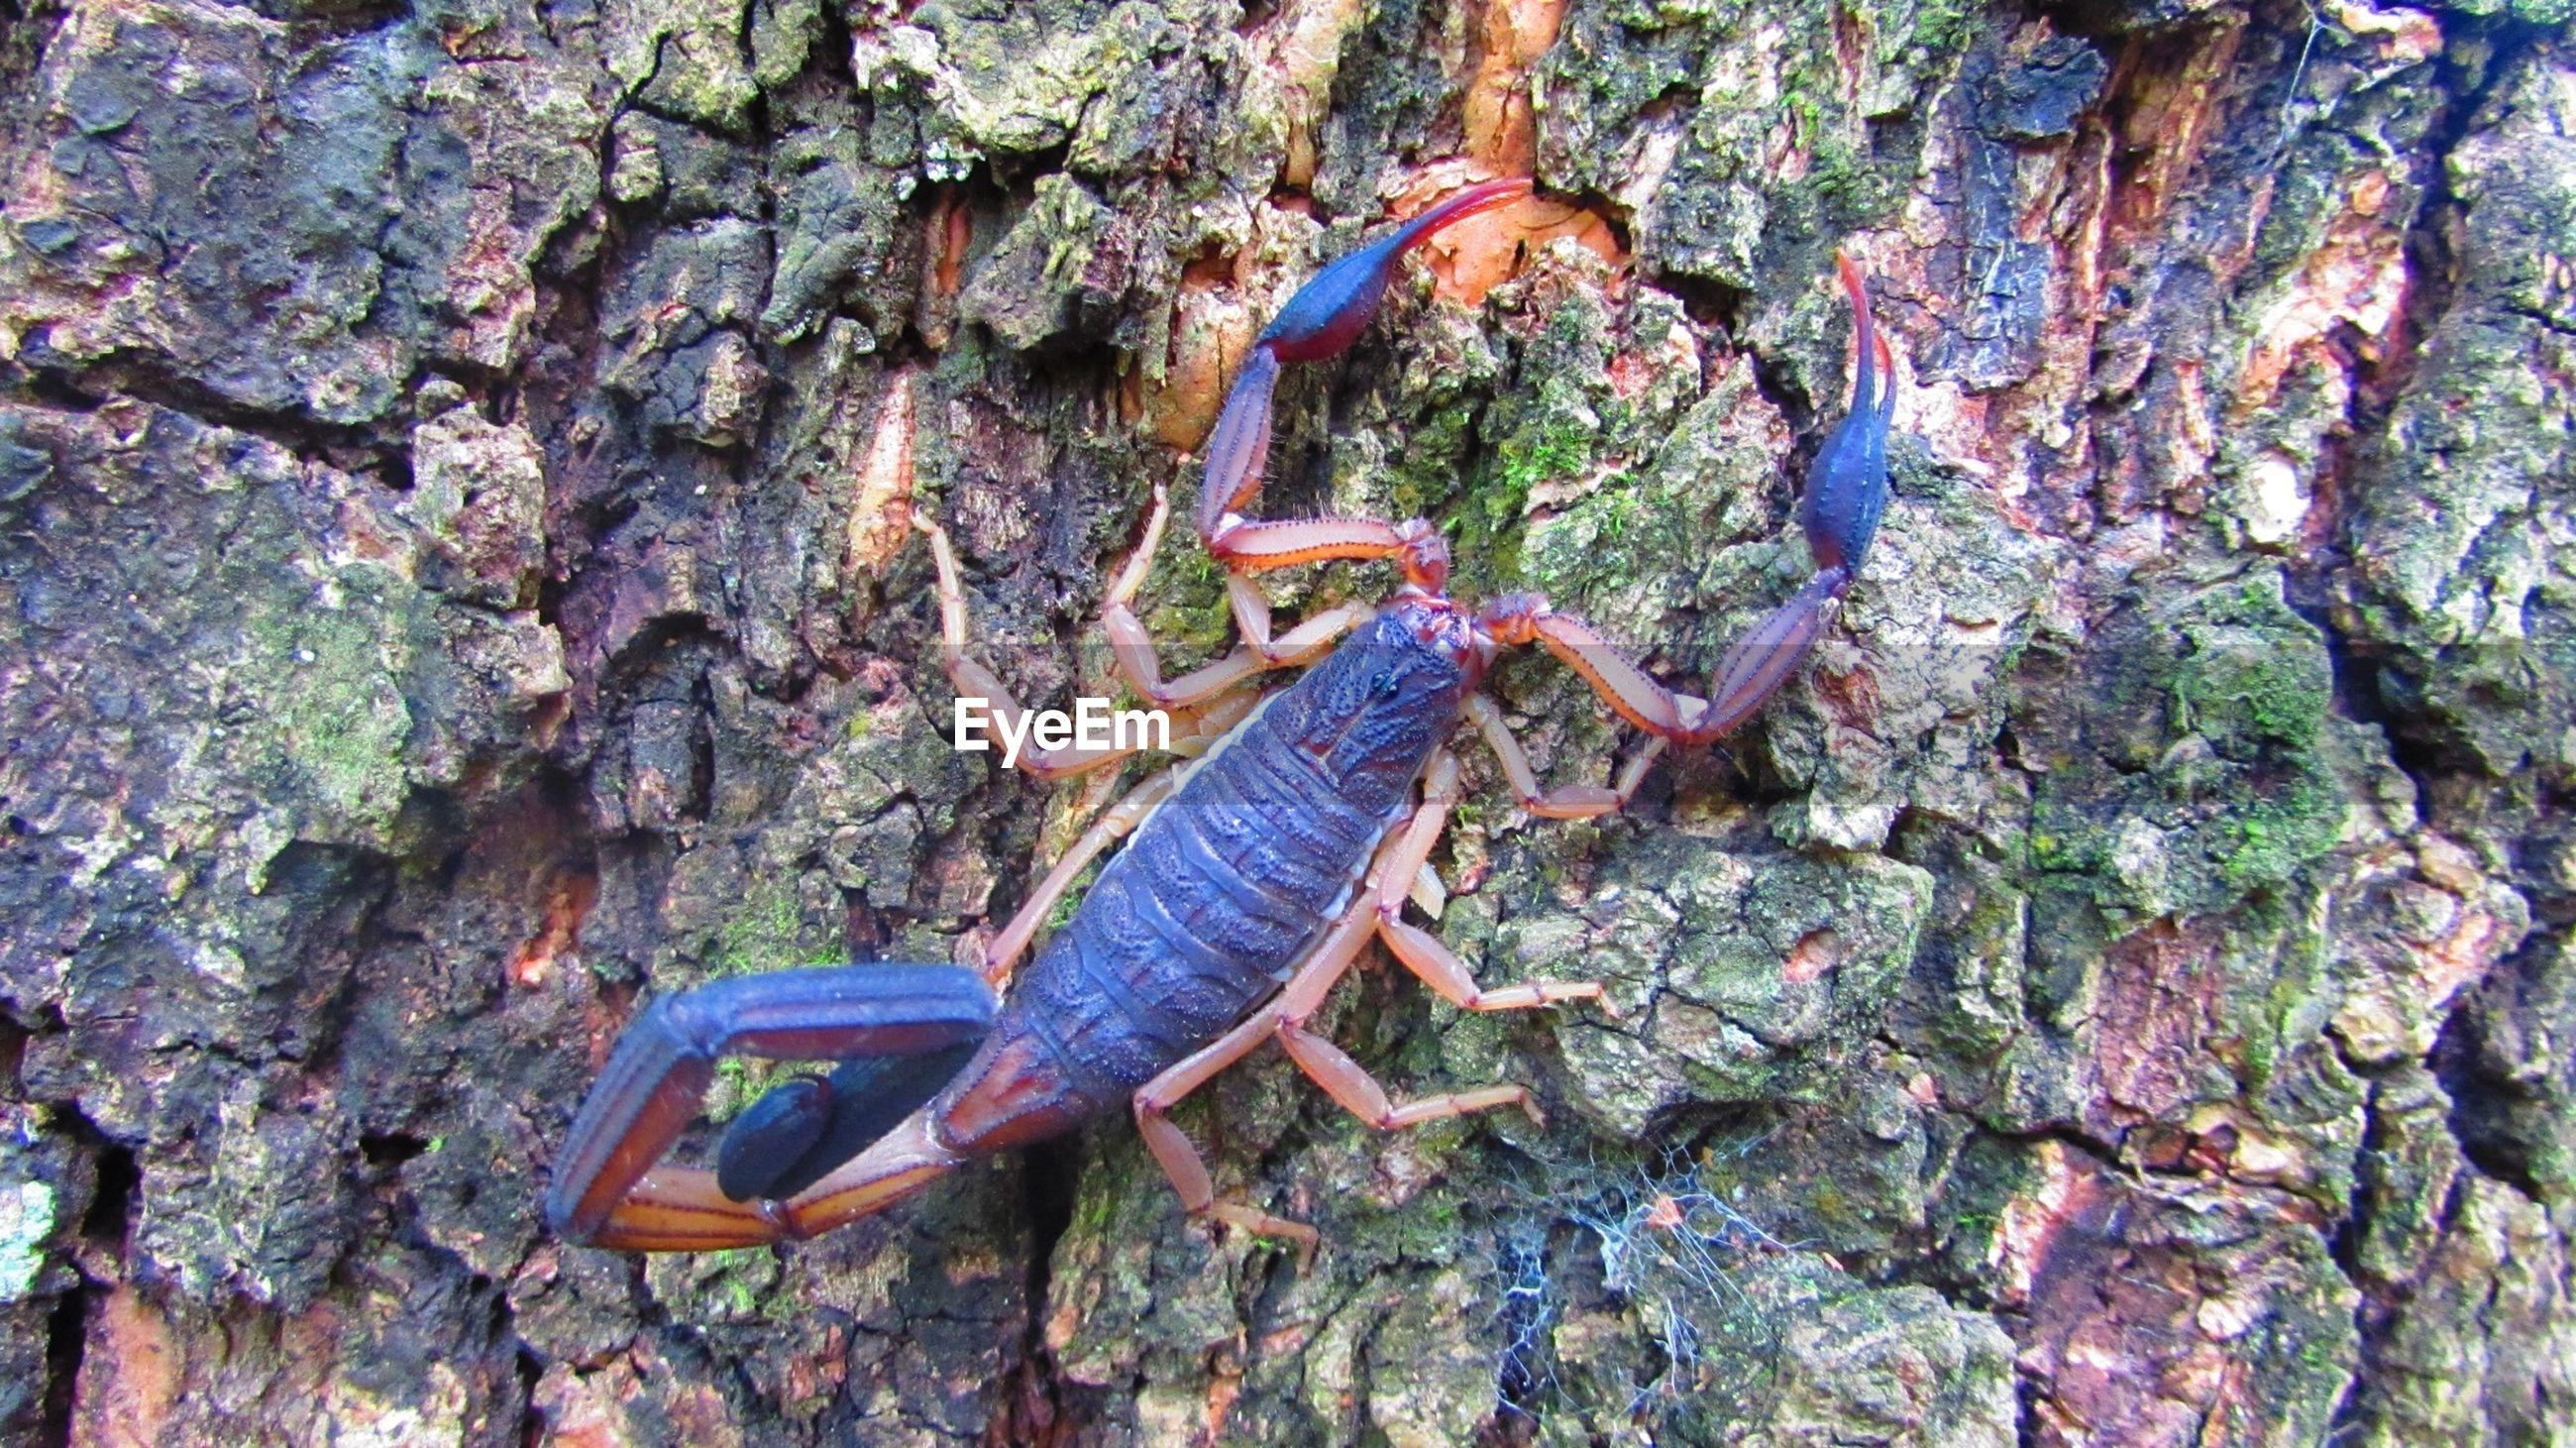 Close-up of scorpion on tree trunk